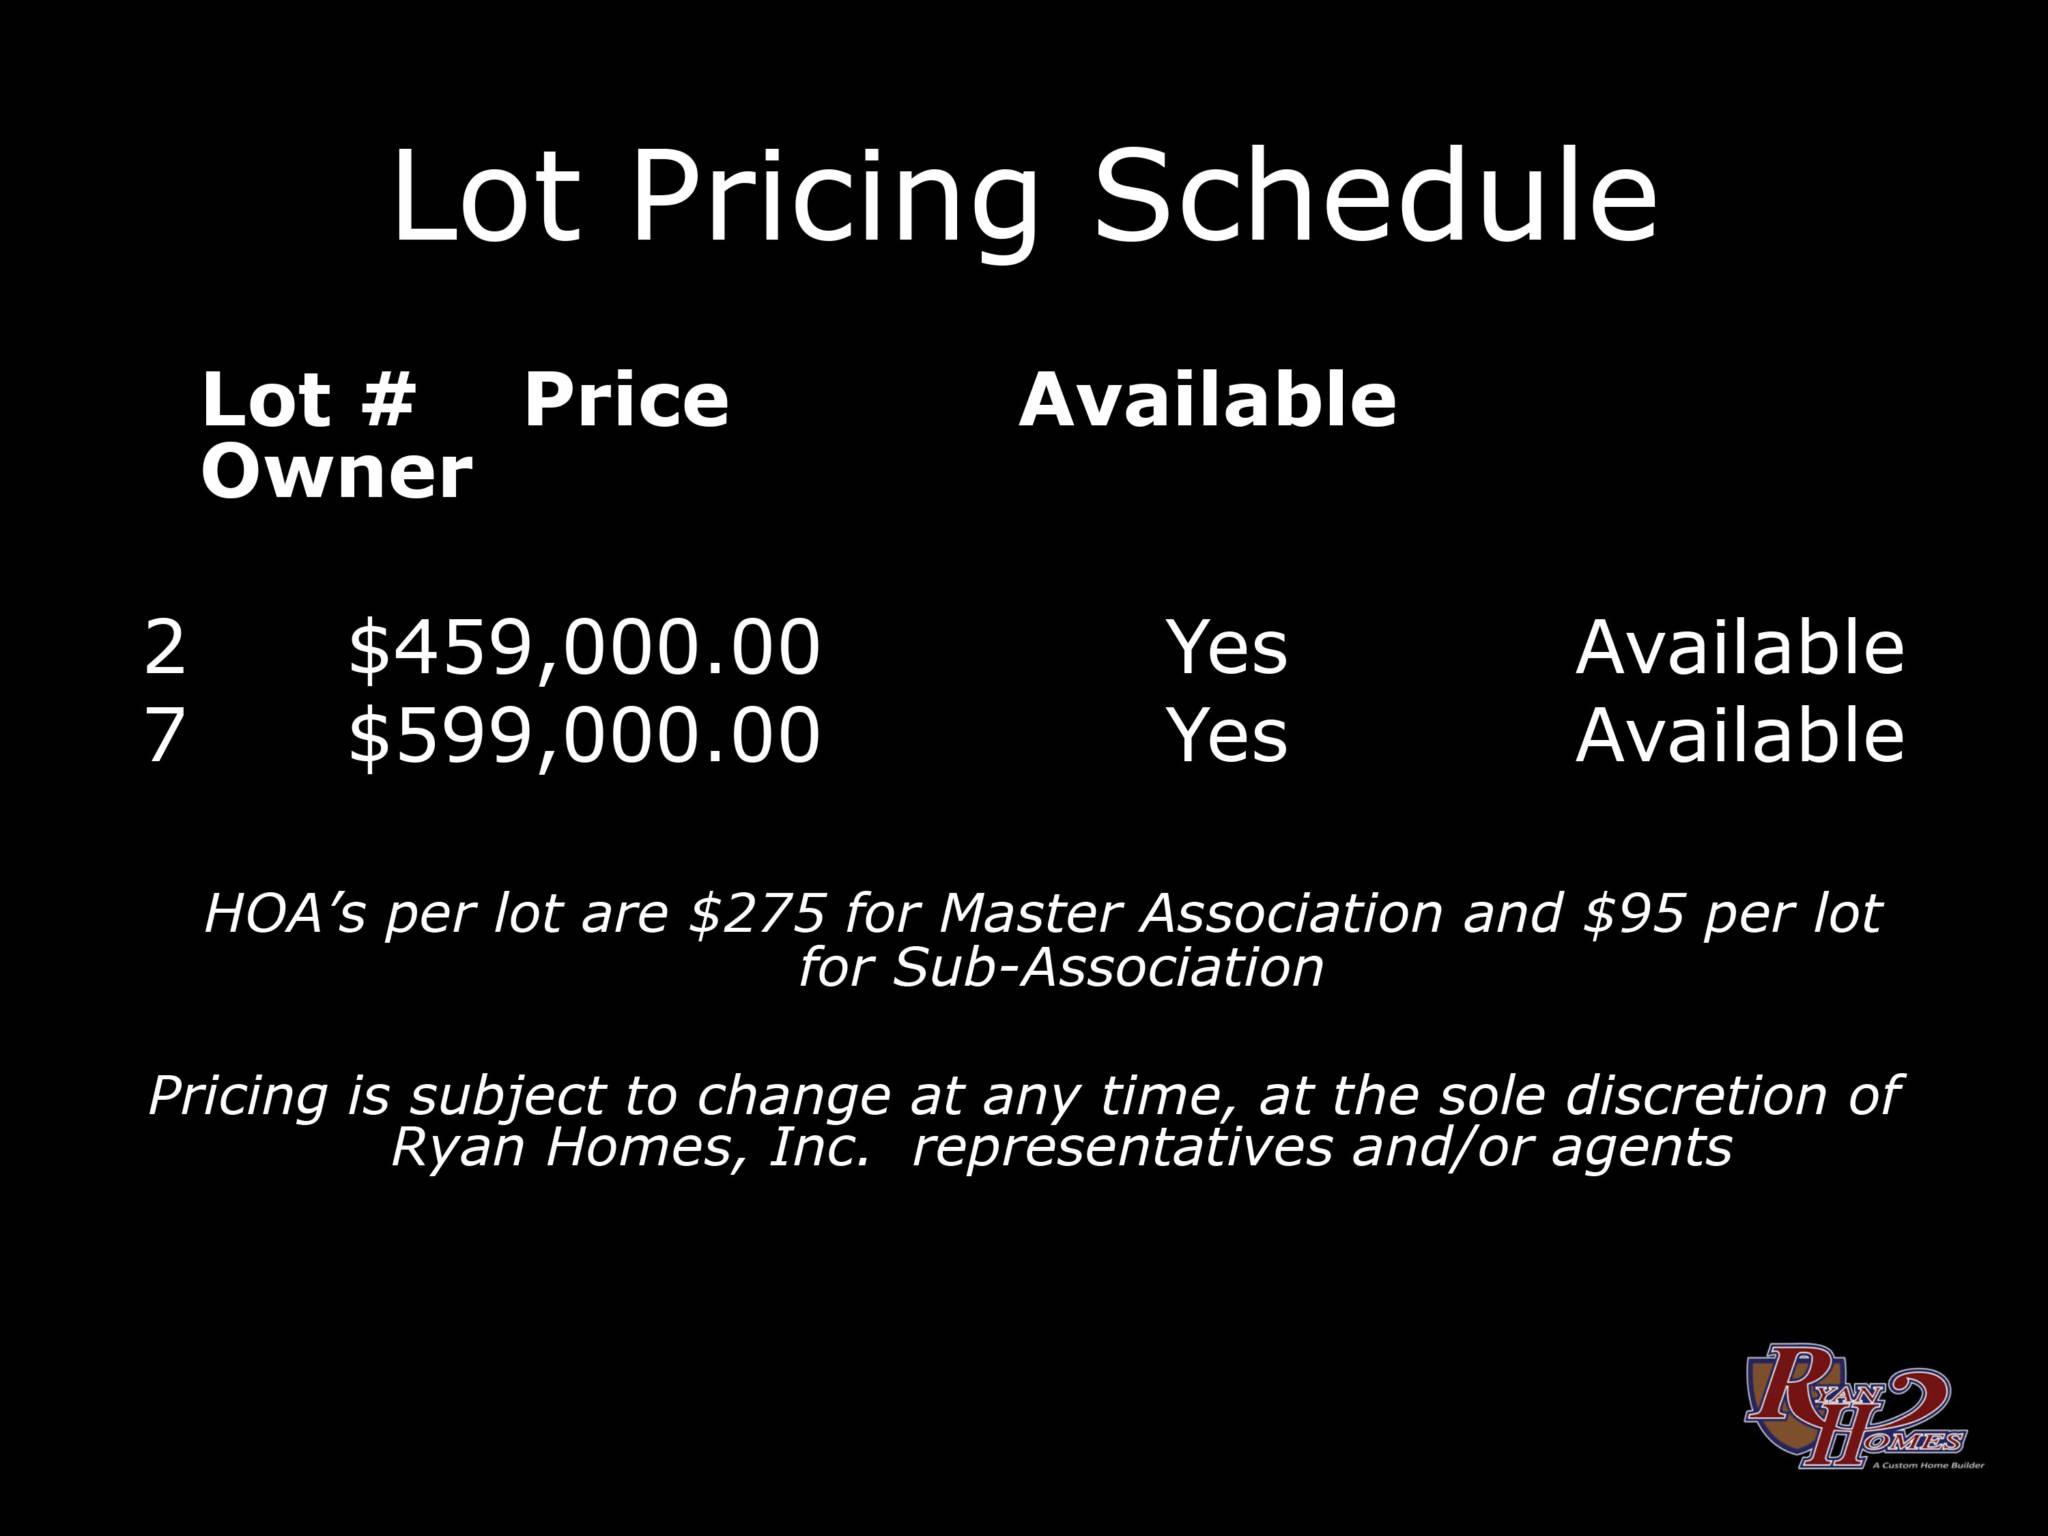 11-19-19 Lot Pricing